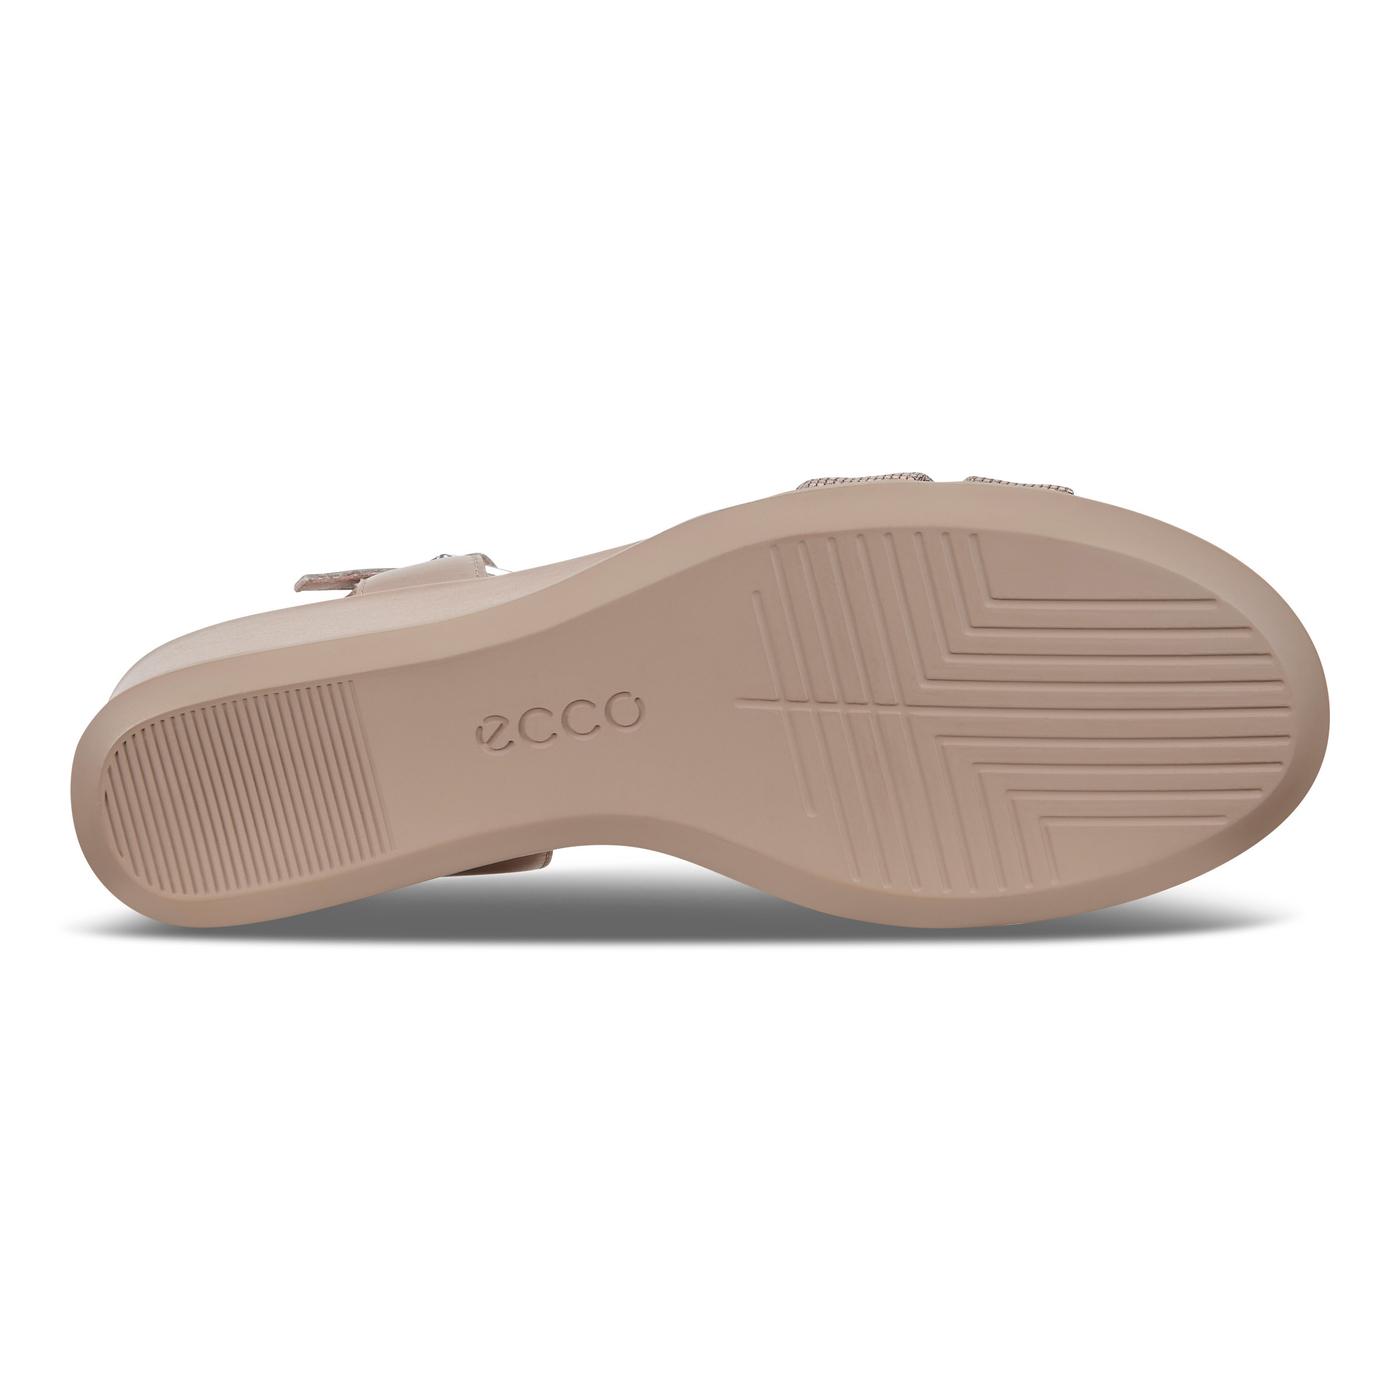 ECCO SHAPE WEDGE SANDAL T-Strap 35mm